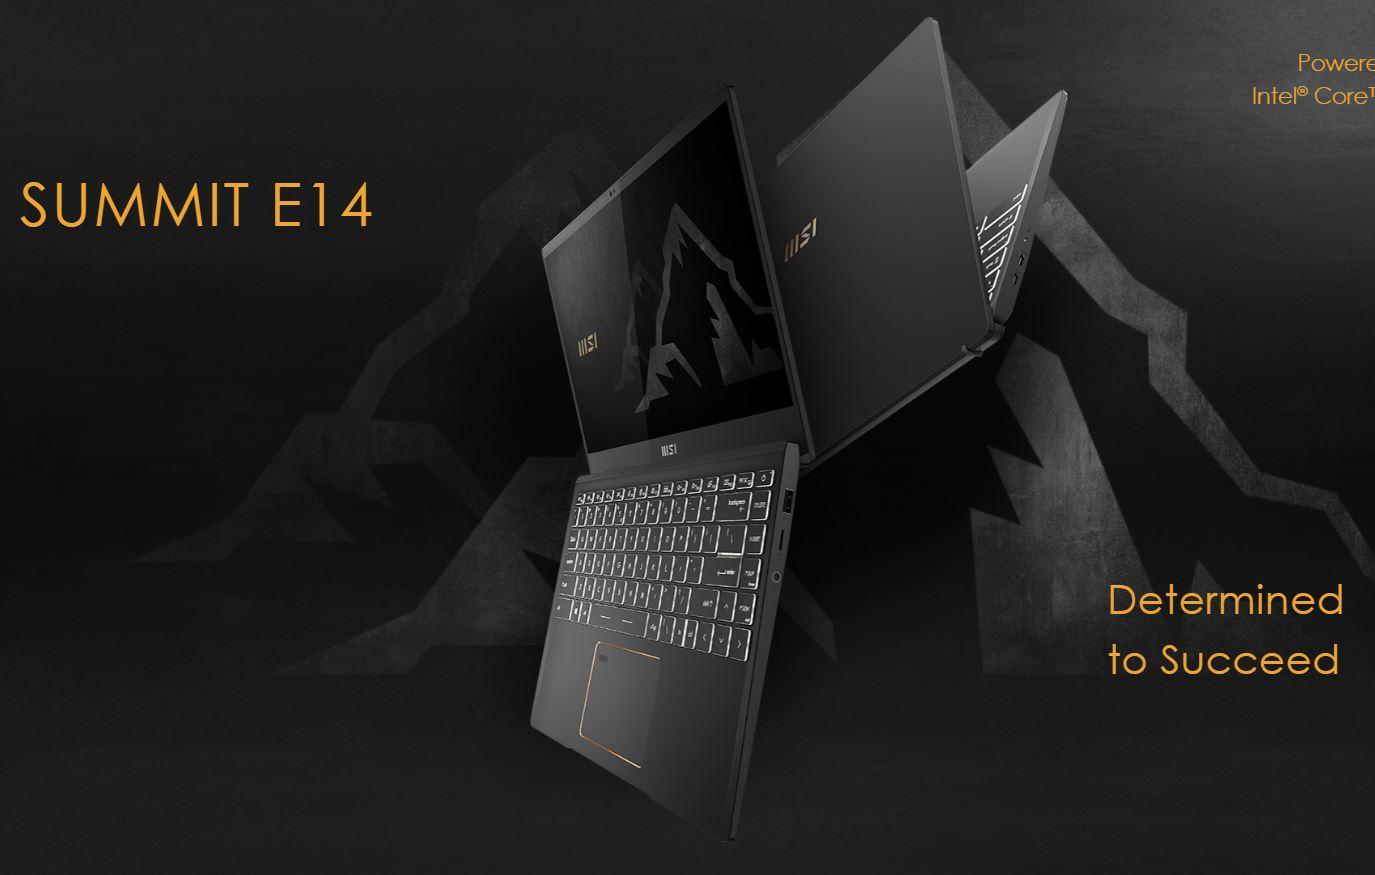 MSI Summit E14 A11SCST 229ID, Laptop Bisnis Tipis yang Powerful Bertenaga Core i7-1185G7